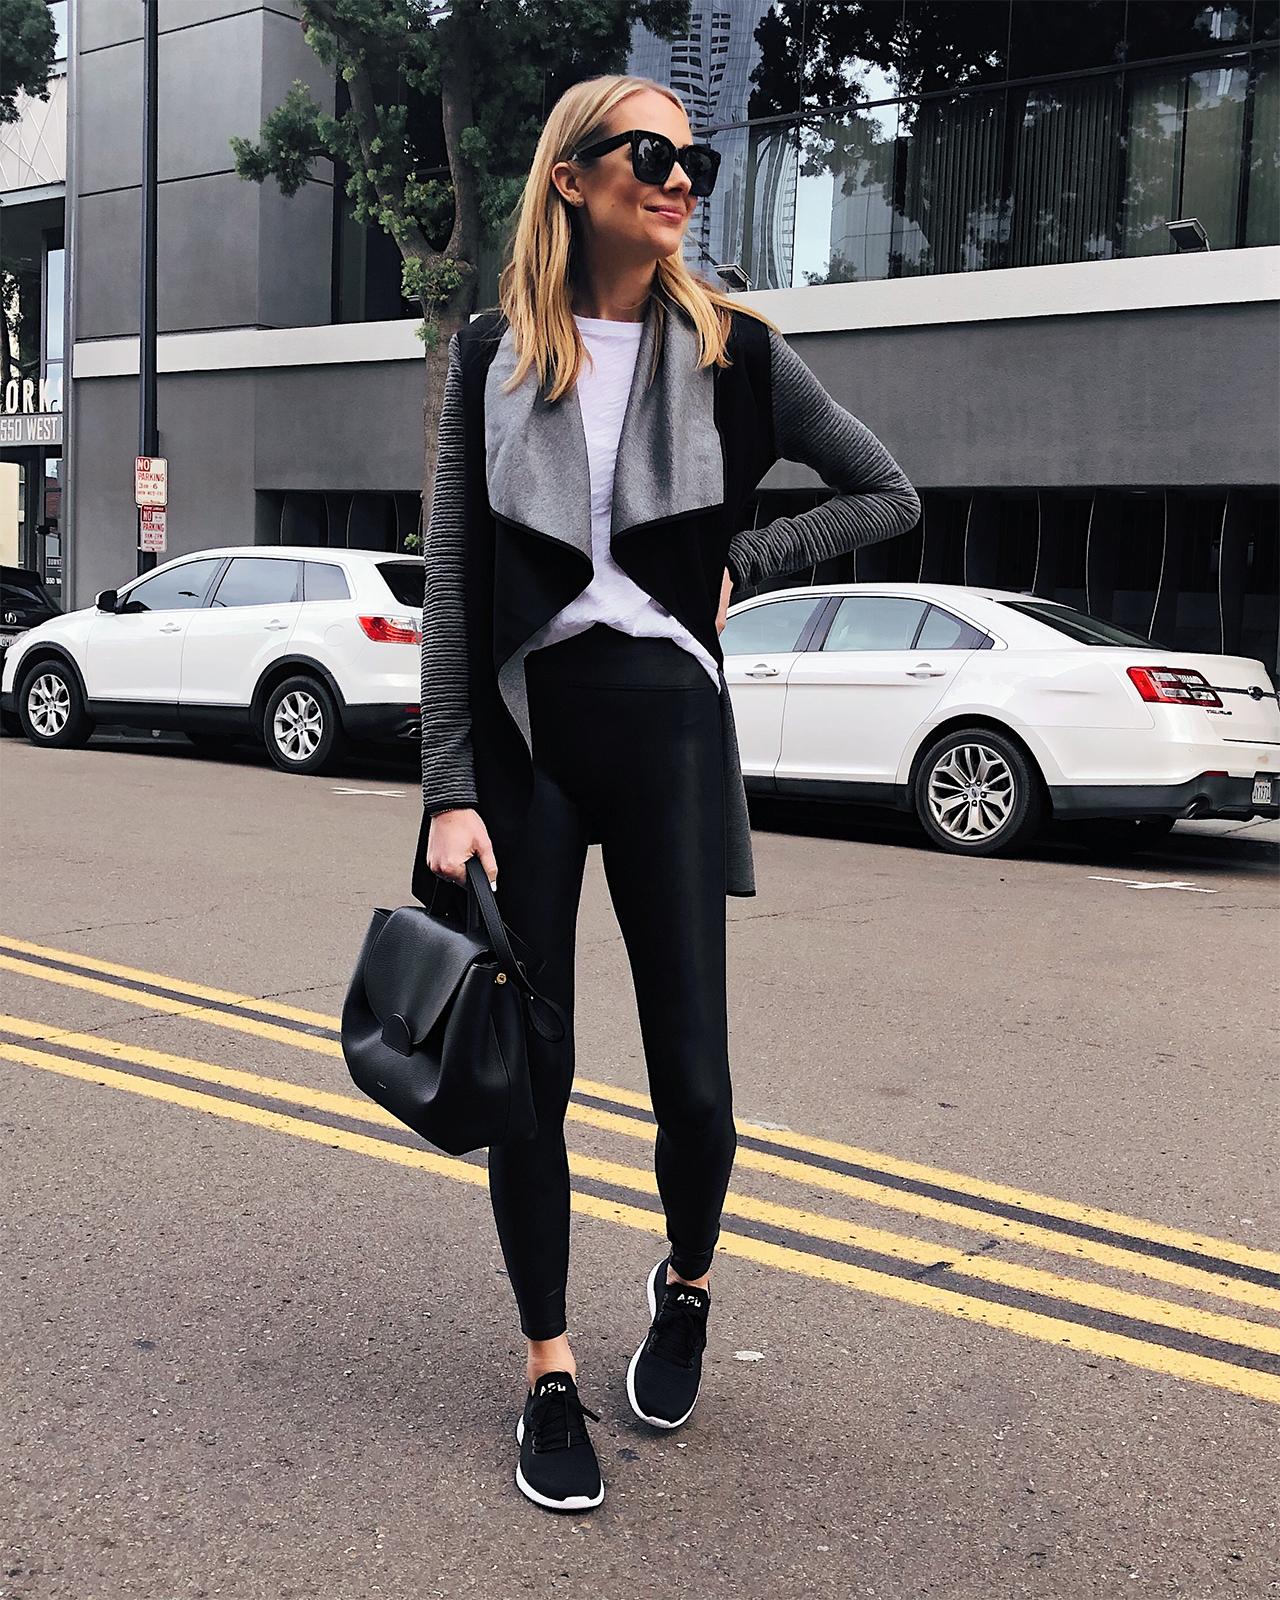 Fashion Jackson Daily Look San Diego Fashion Blogger